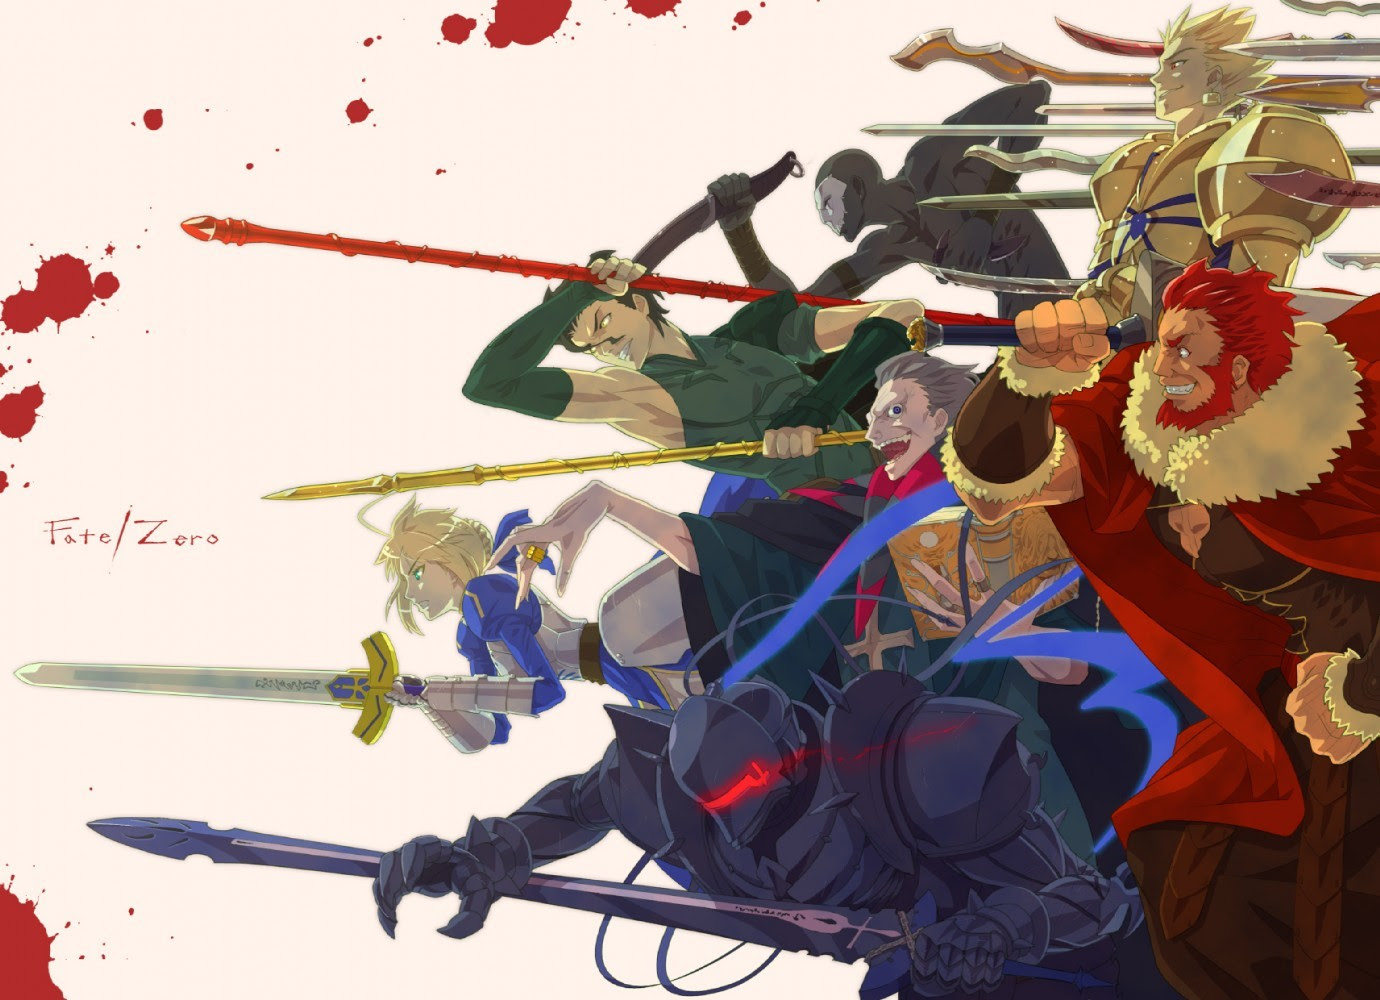 Fate Zero 壁紙 画像 Iphone スマホ待受画像 Nebigen